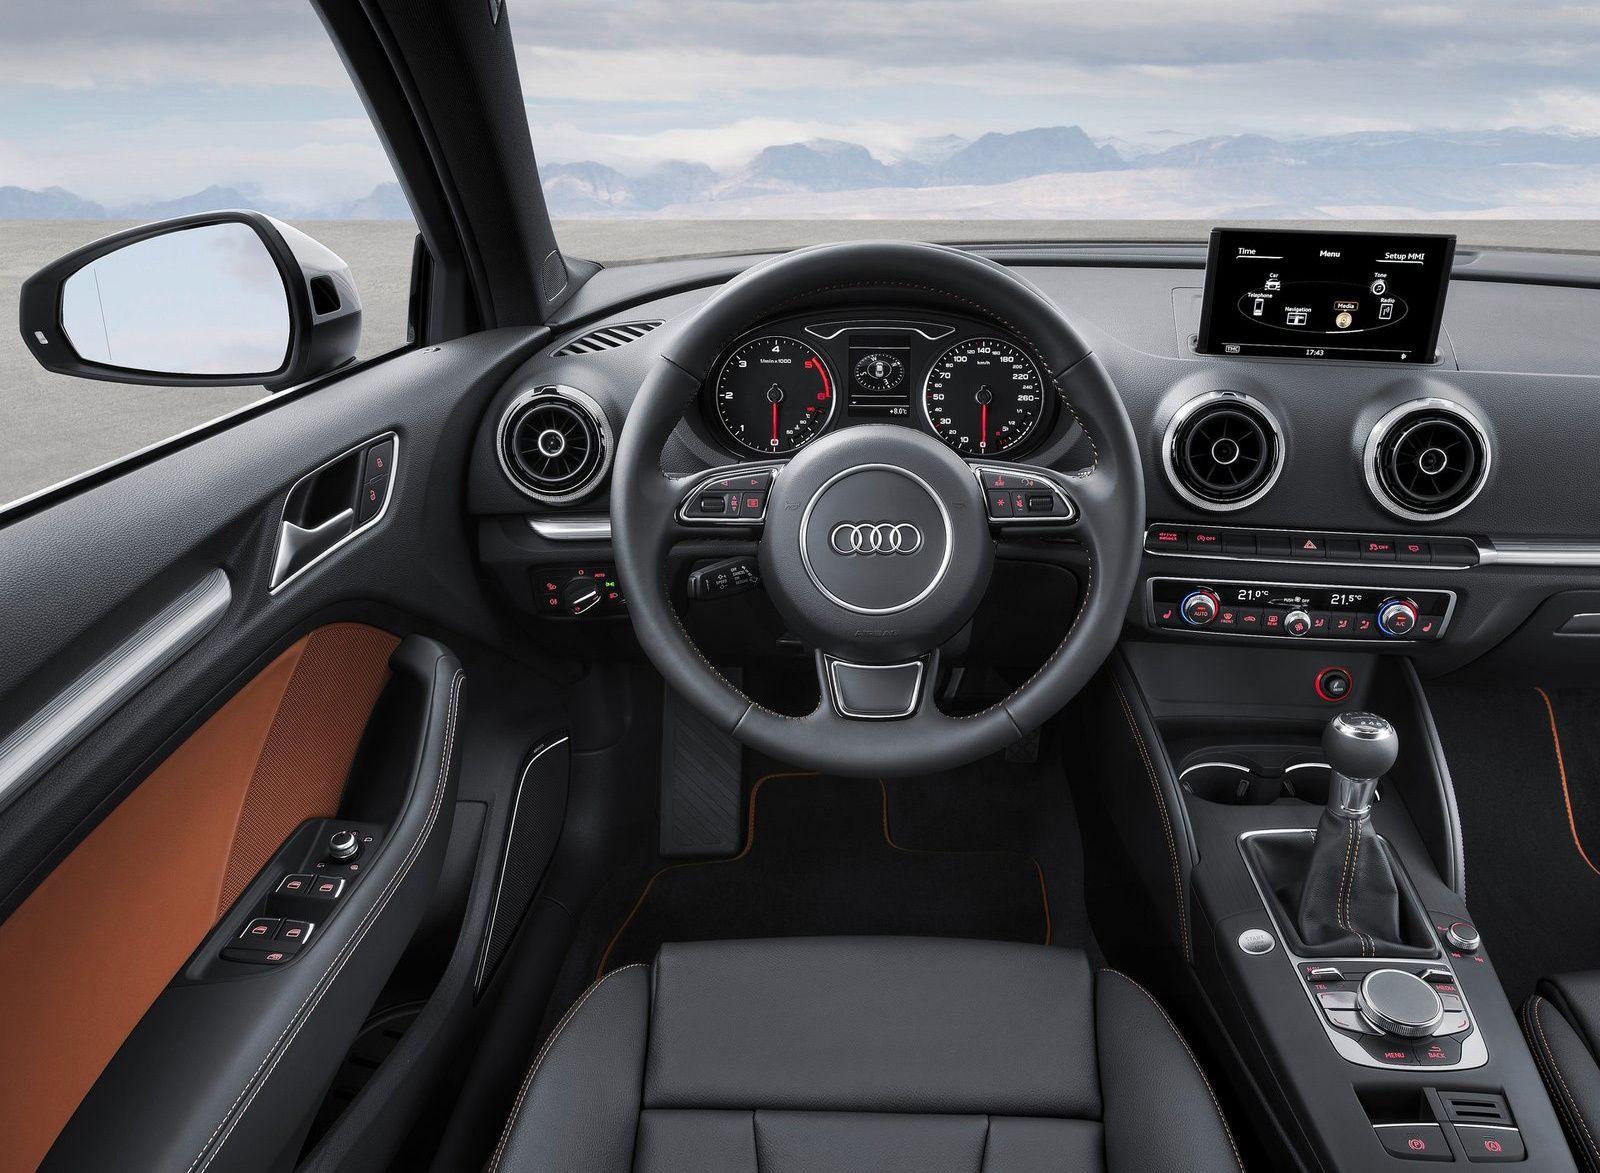 Audi A3 Sedan 2013 Audi A3 Sedan Audi A3 Audi